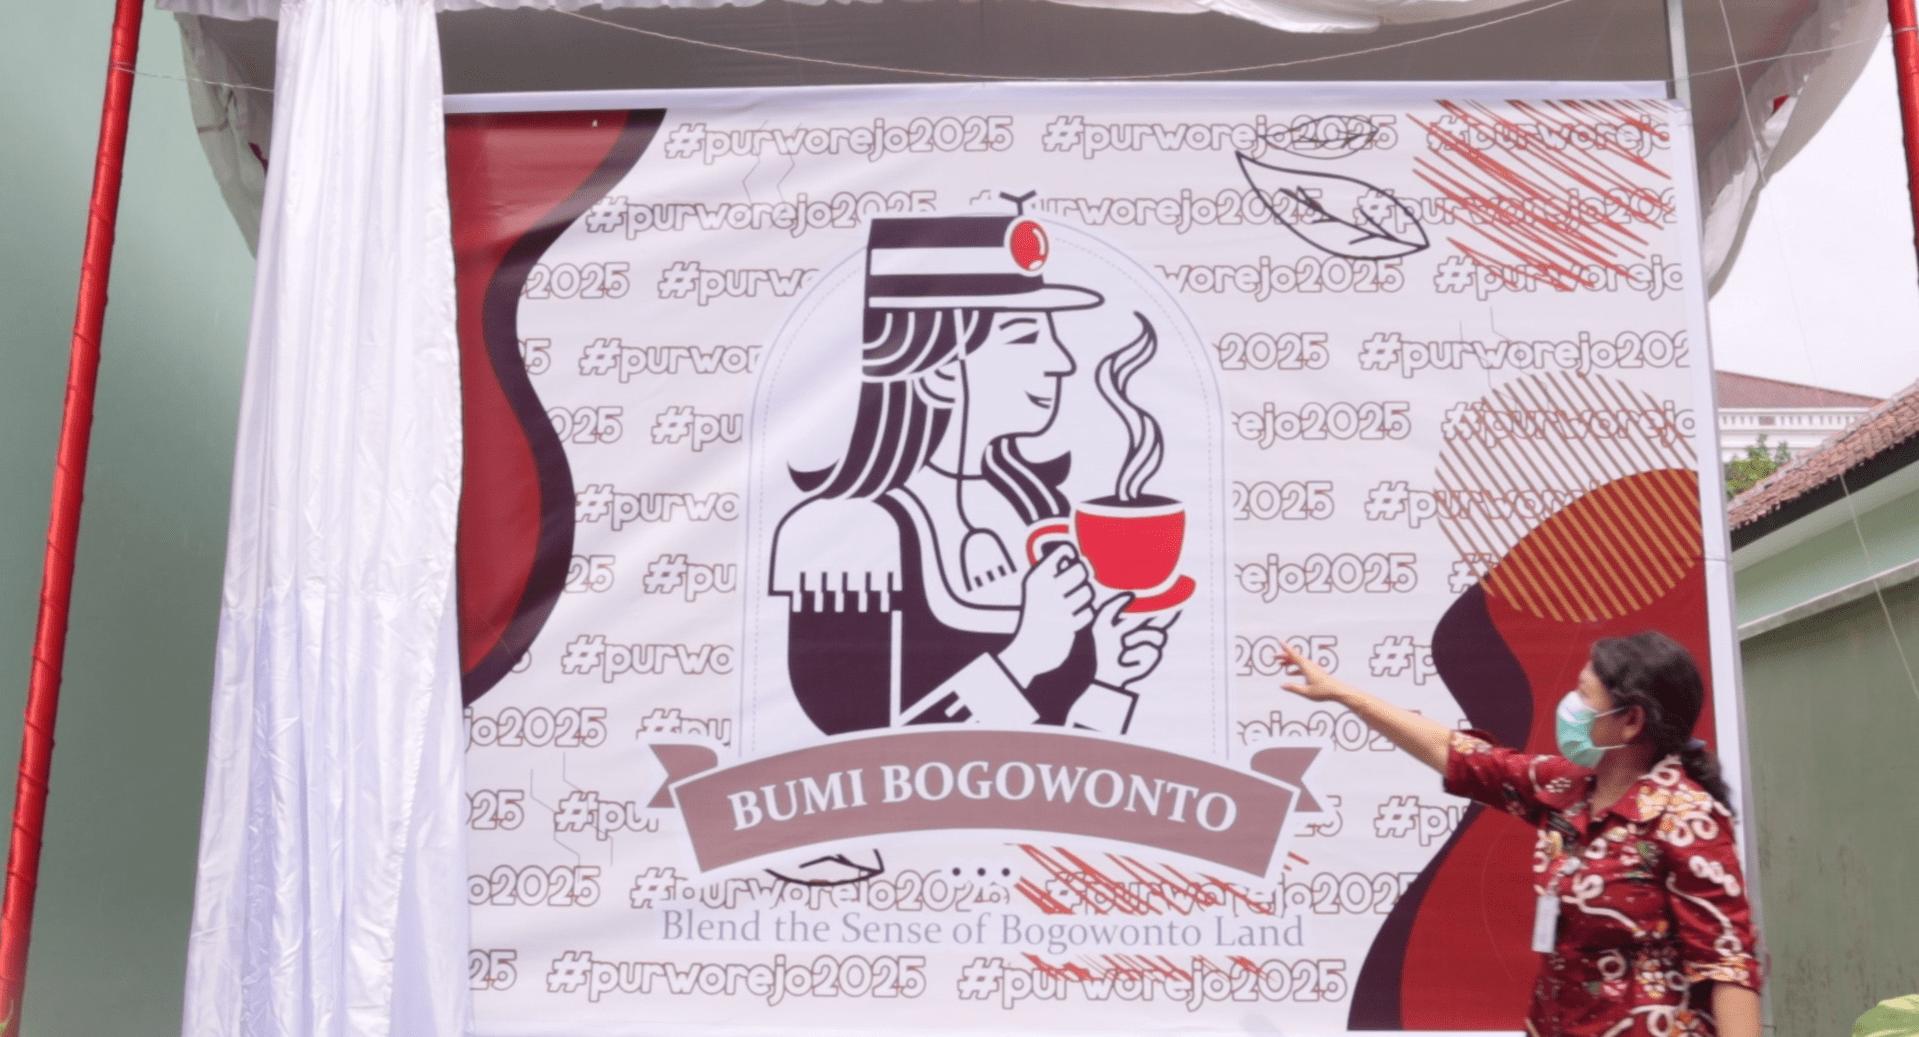 PJs Bupati Purworejo Launching Logo dan Tagline Kopi Purworejo